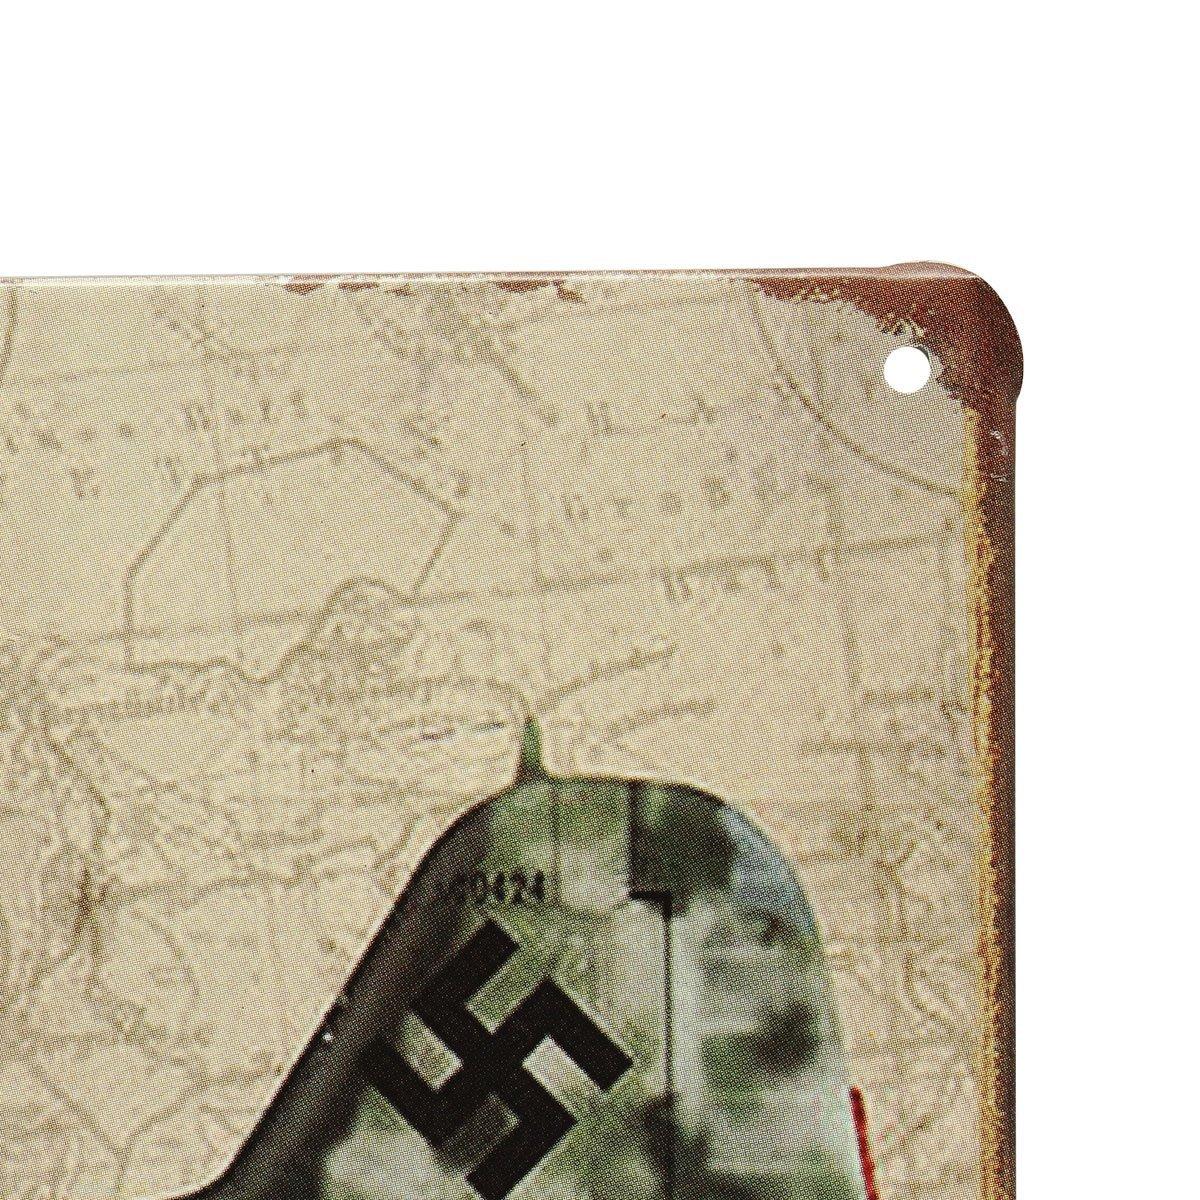 20x30cm World War Vintage Military Battle Plane Sheet Metal Drawing Decor Wall Art Plaques Signs